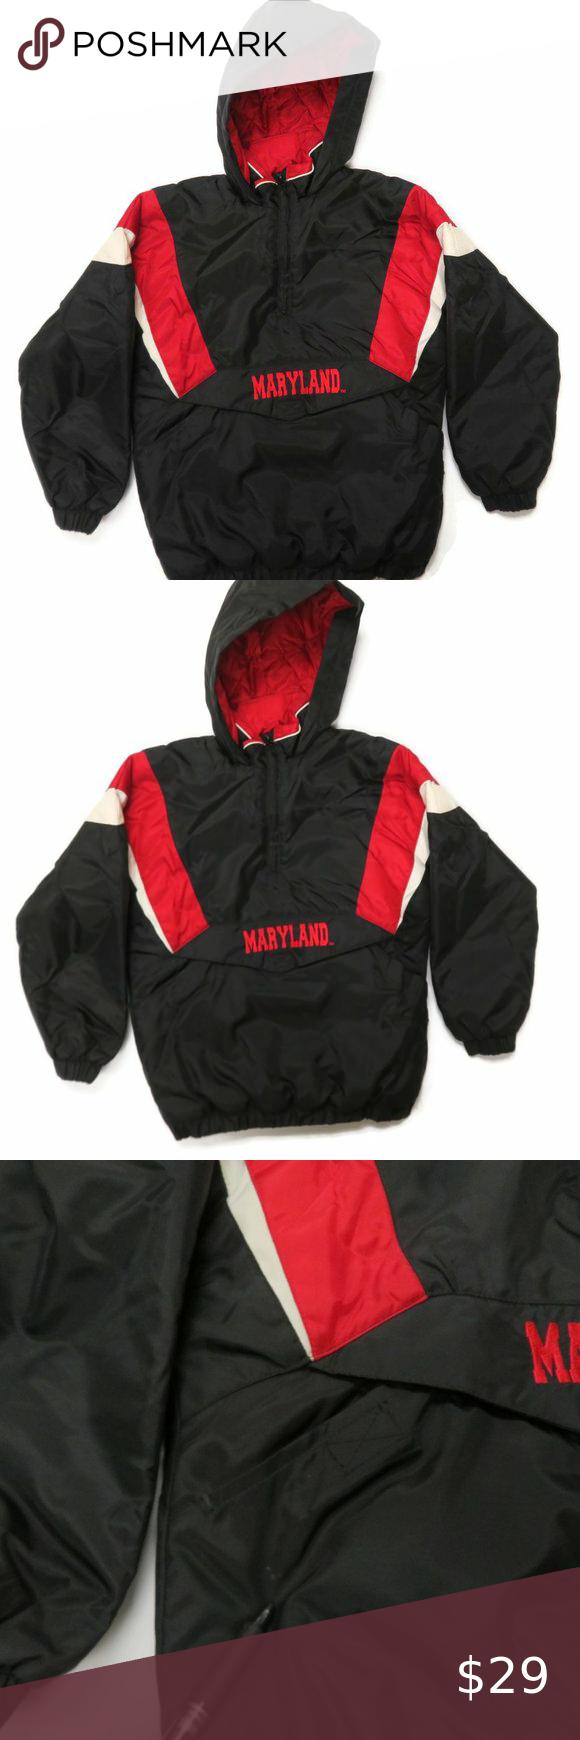 Reebok Heisman Collection Maryland Puffer Jacket Jackets Pullover Jacket Puffer Jackets [ 1740 x 580 Pixel ]